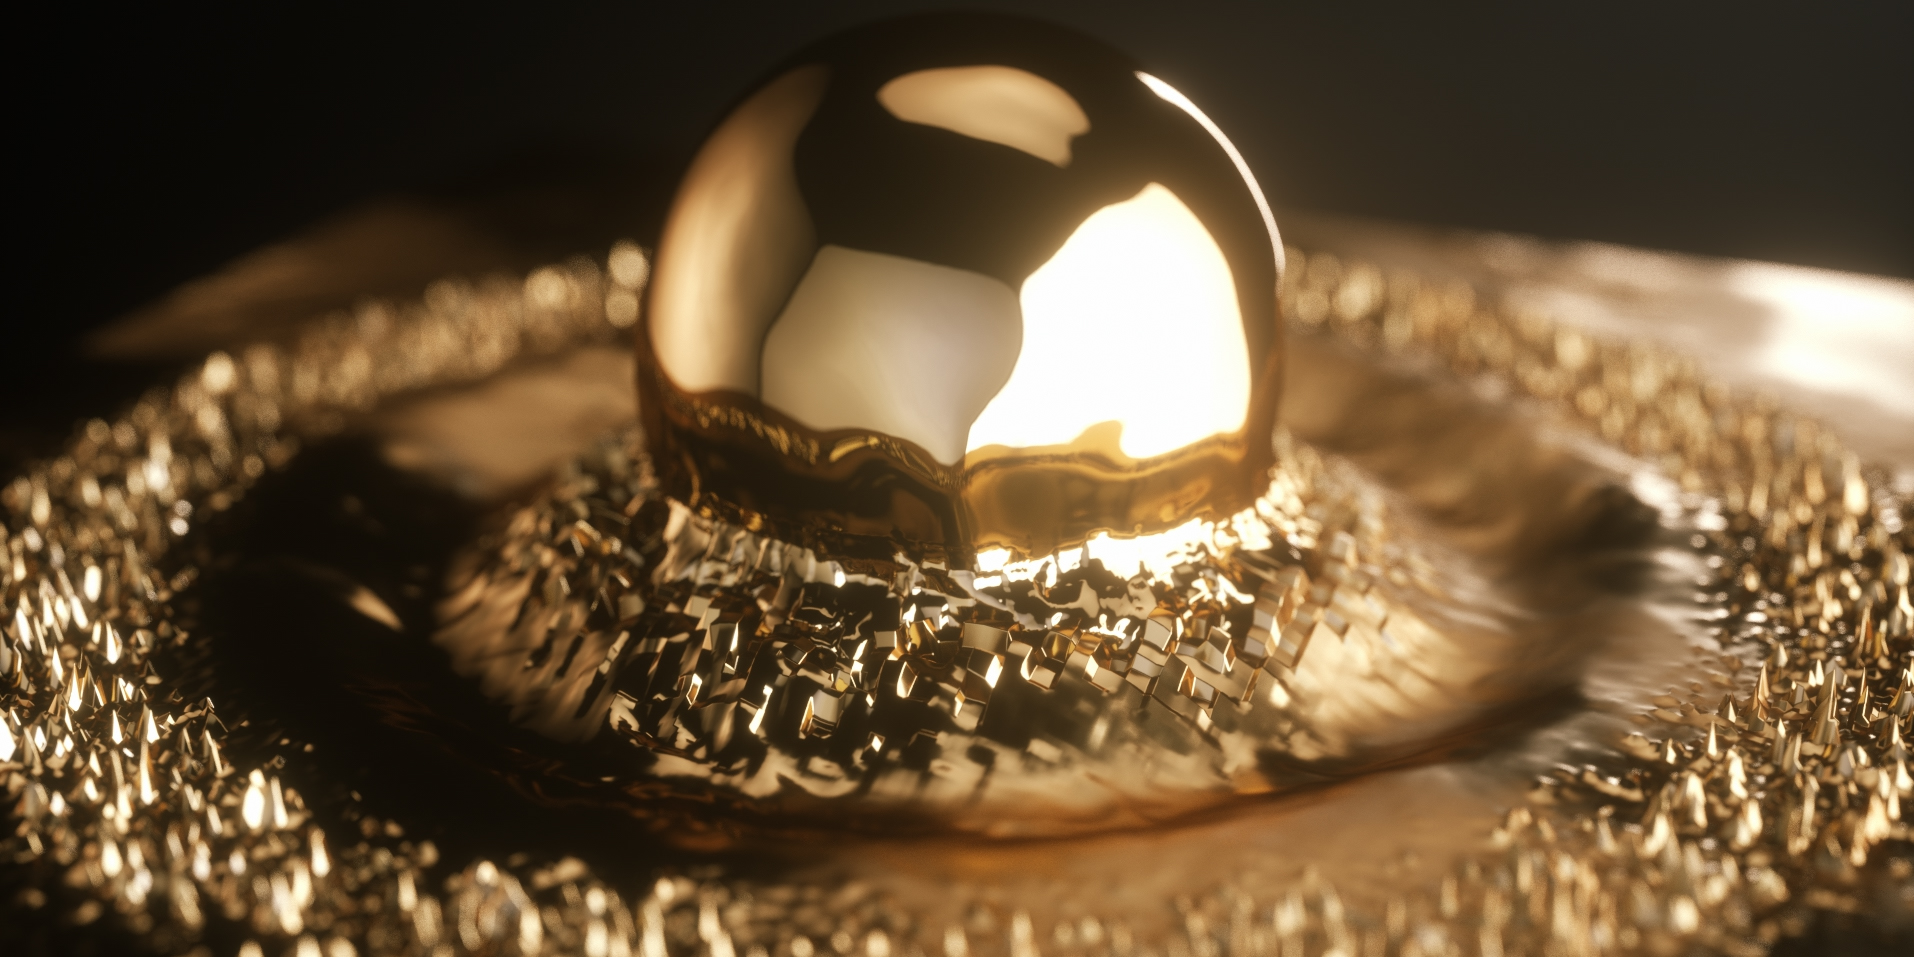 Telemundo | FIFA World Cup